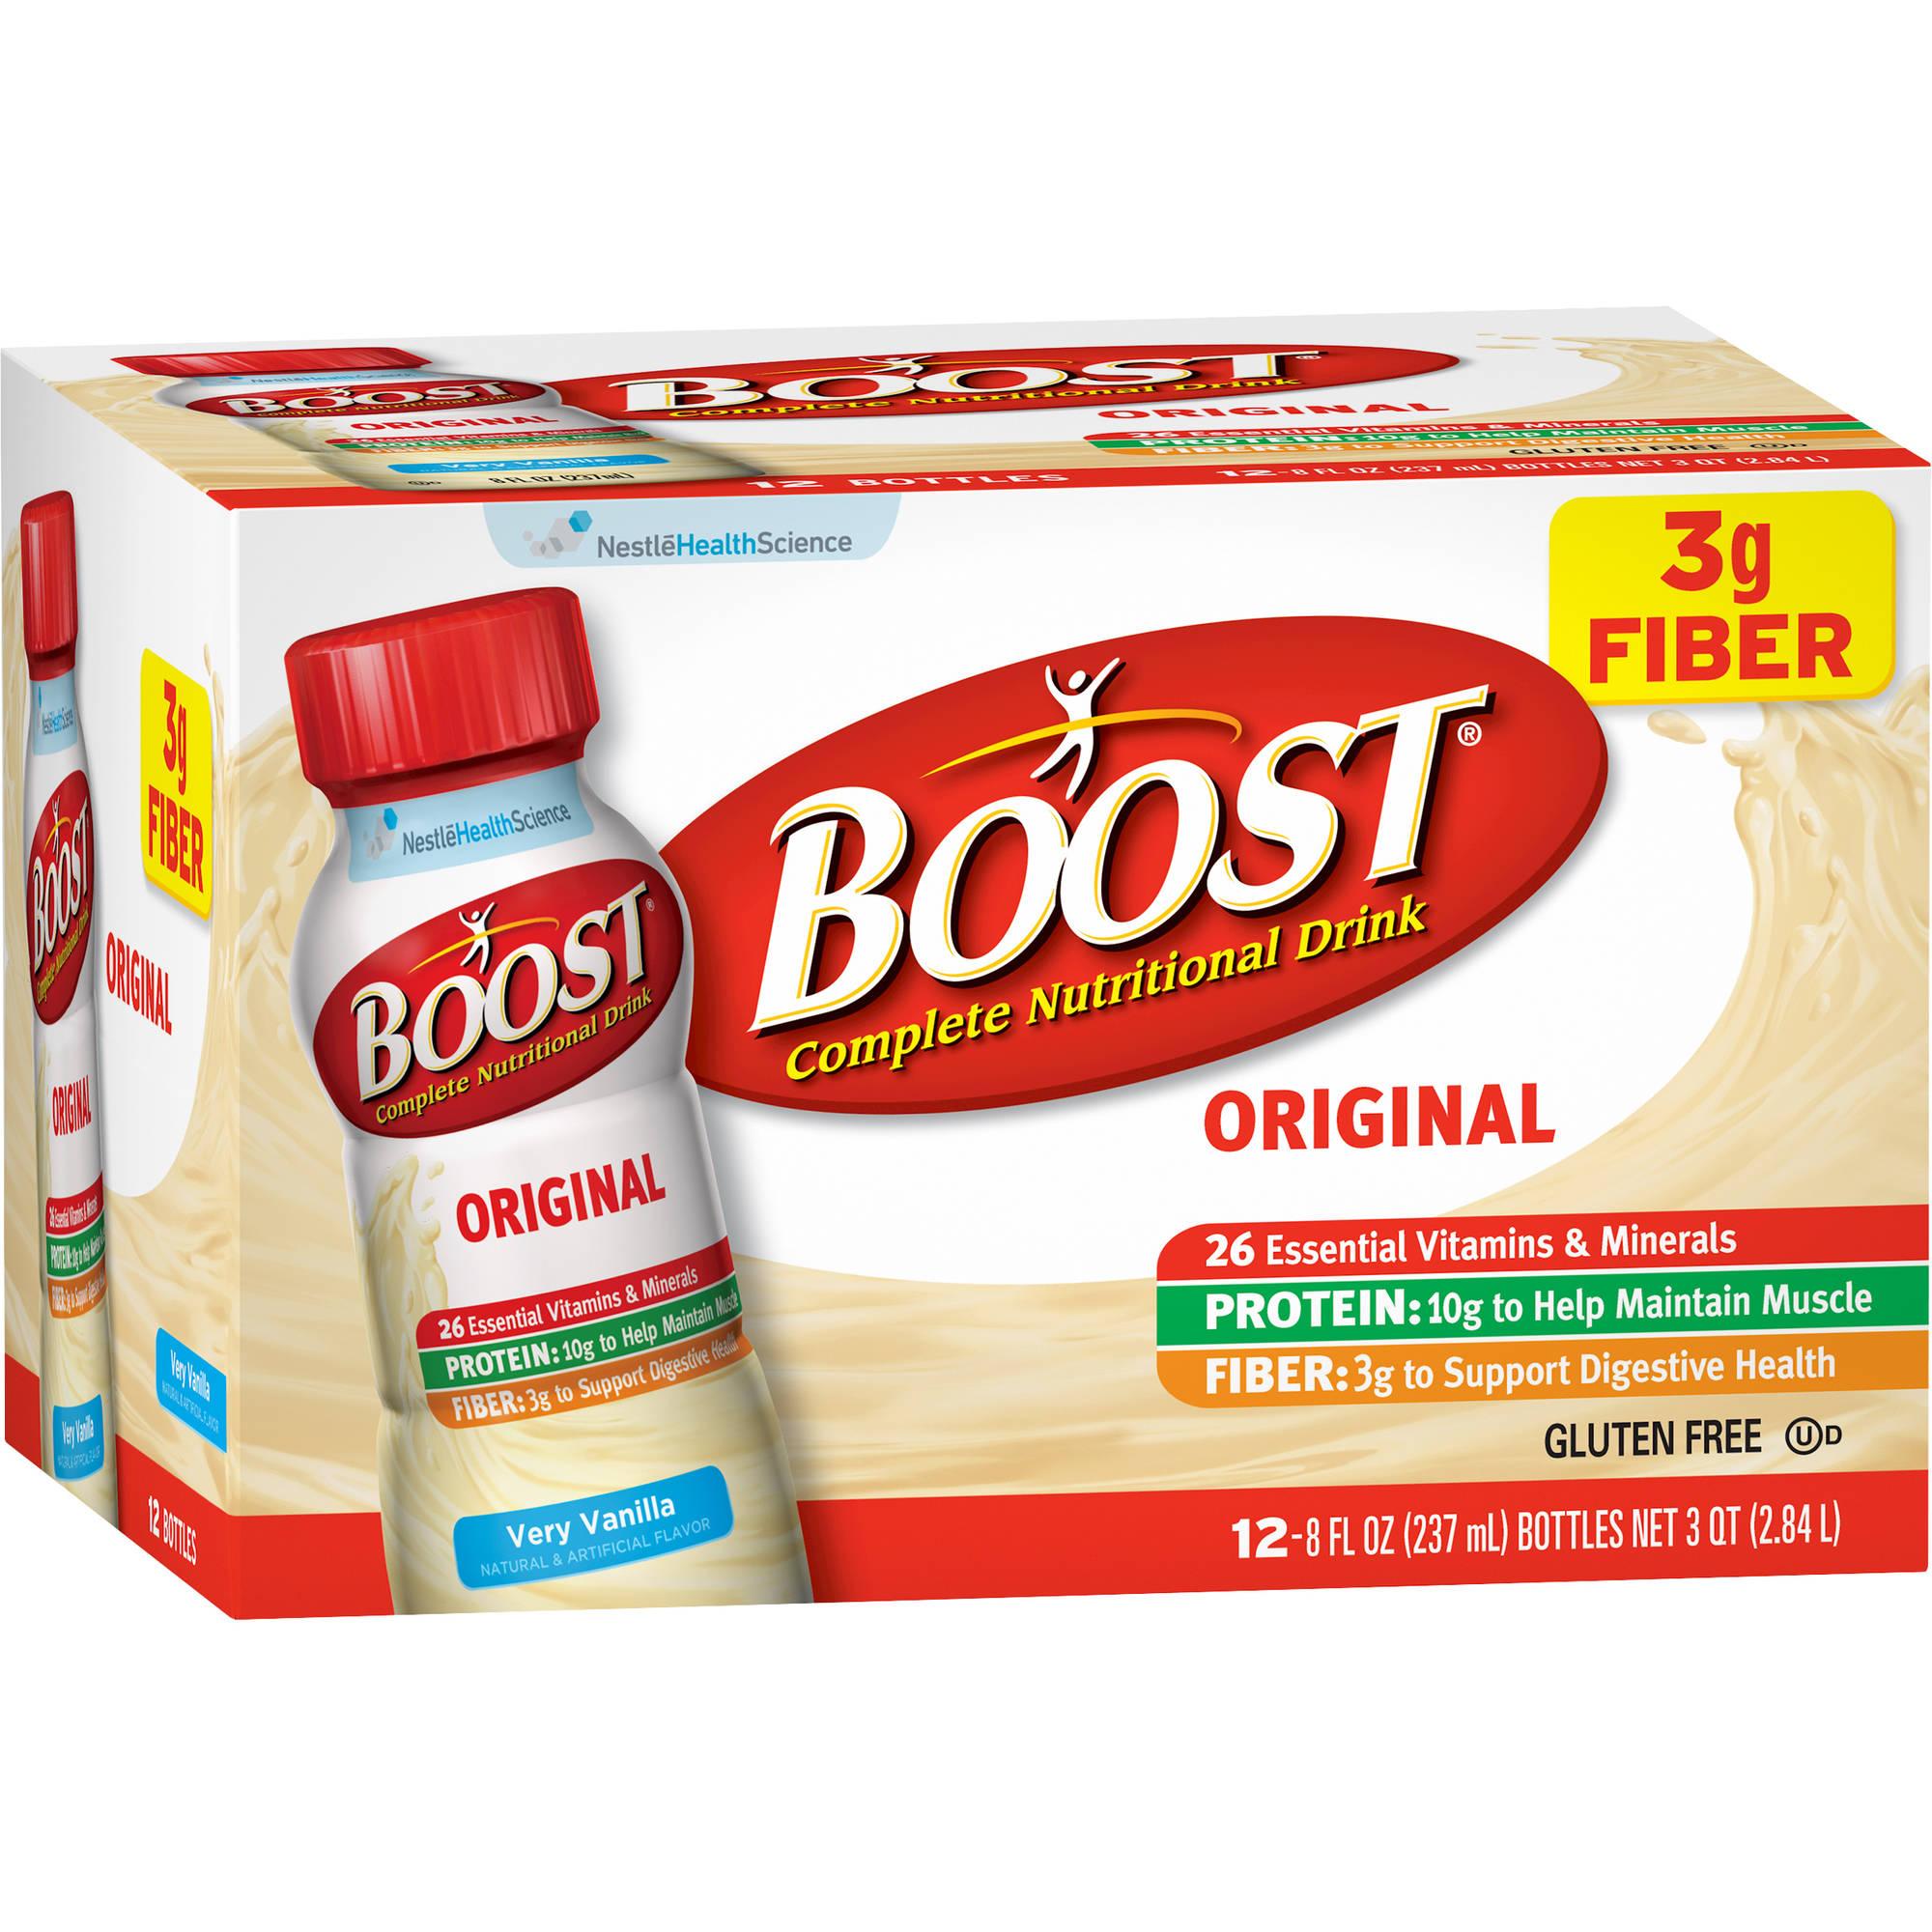 Boost Original Very Vanilla Complete Nutritional Drinks, 8 fl oz, 12 count